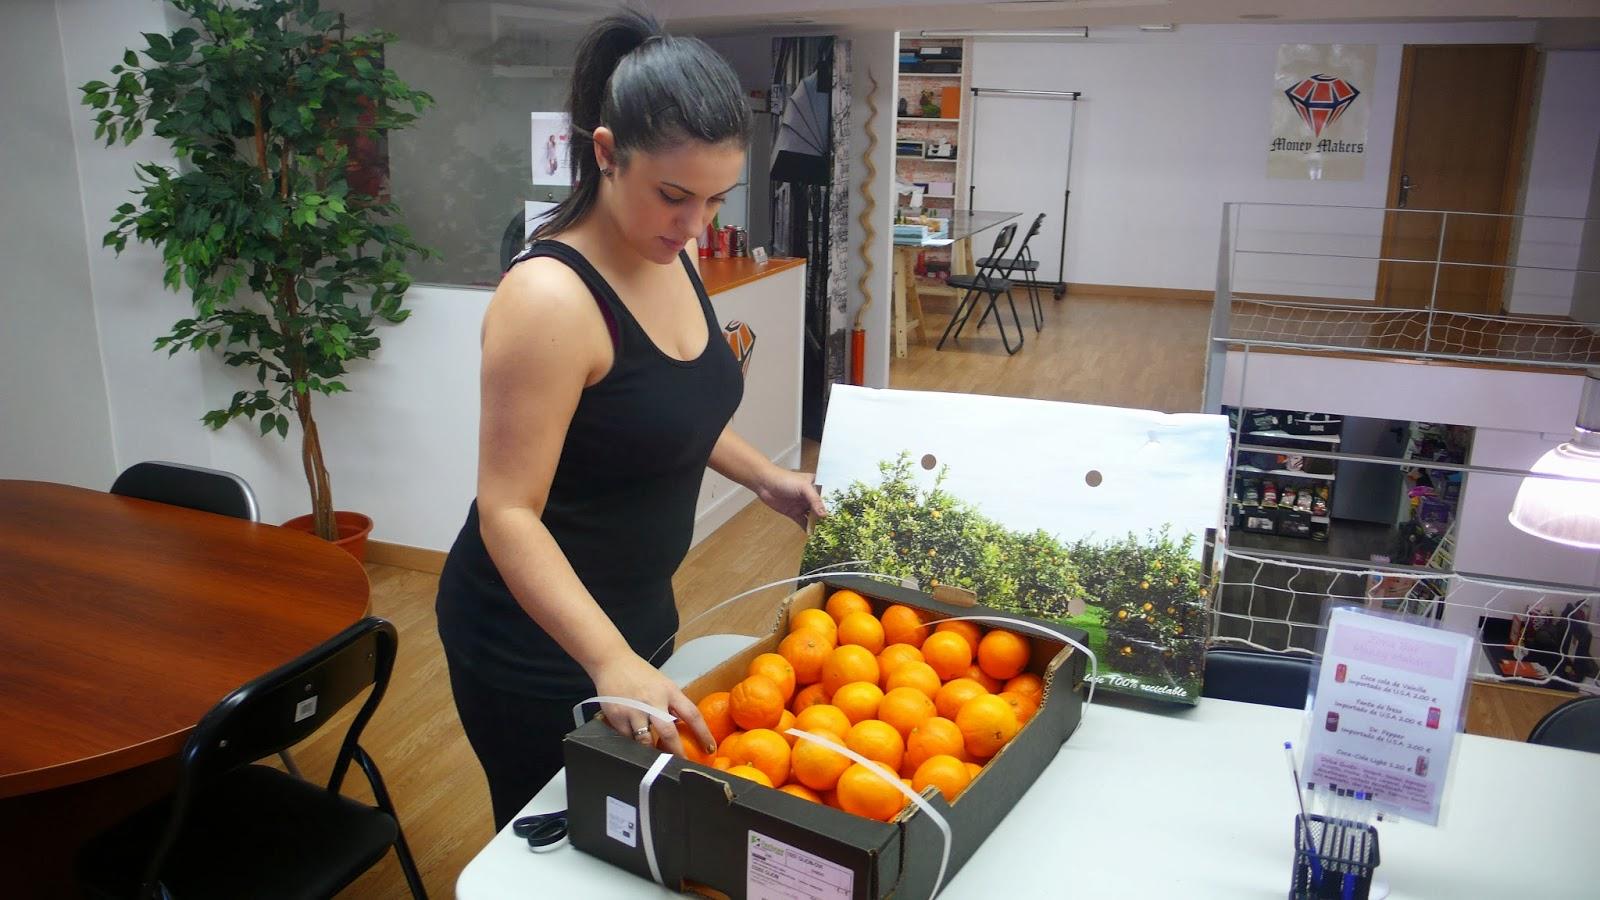 http://www.naranjasche.com/comprar-naranjas-ecologicas